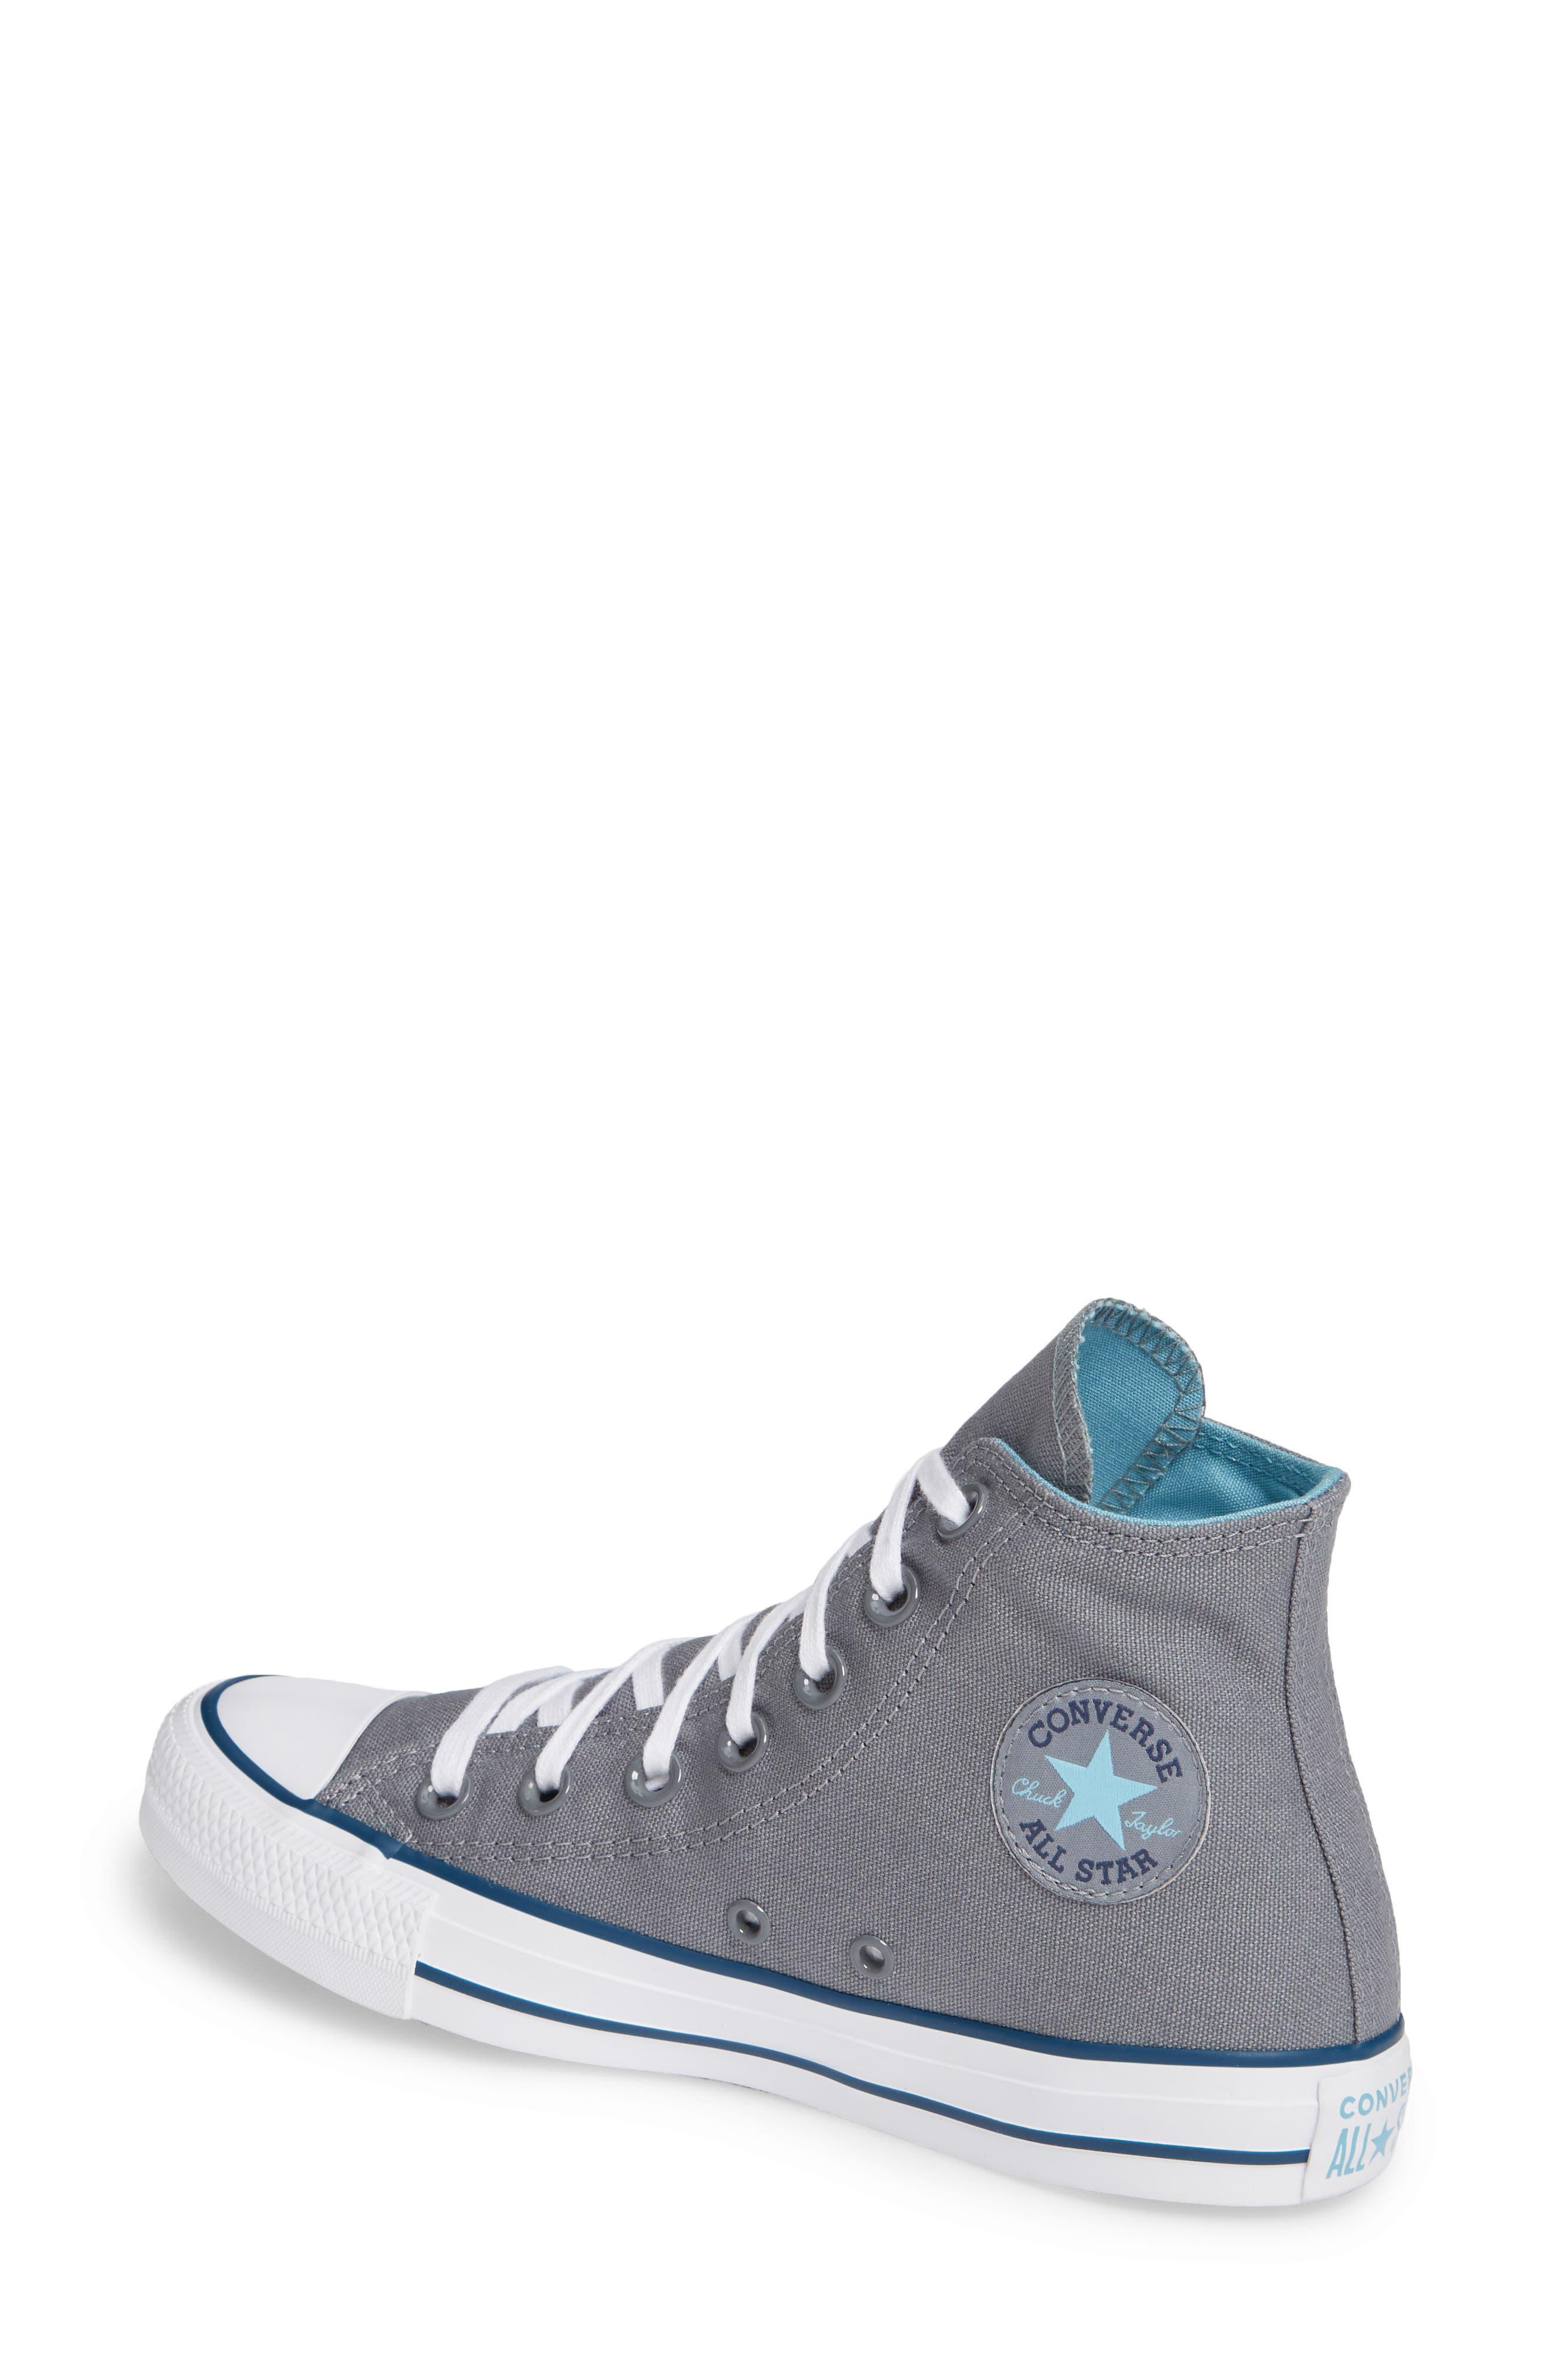 Chuck Taylor<sup>®</sup> All Star<sup>®</sup> Seasonal Hi Sneaker,                             Alternate thumbnail 2, color,                             039